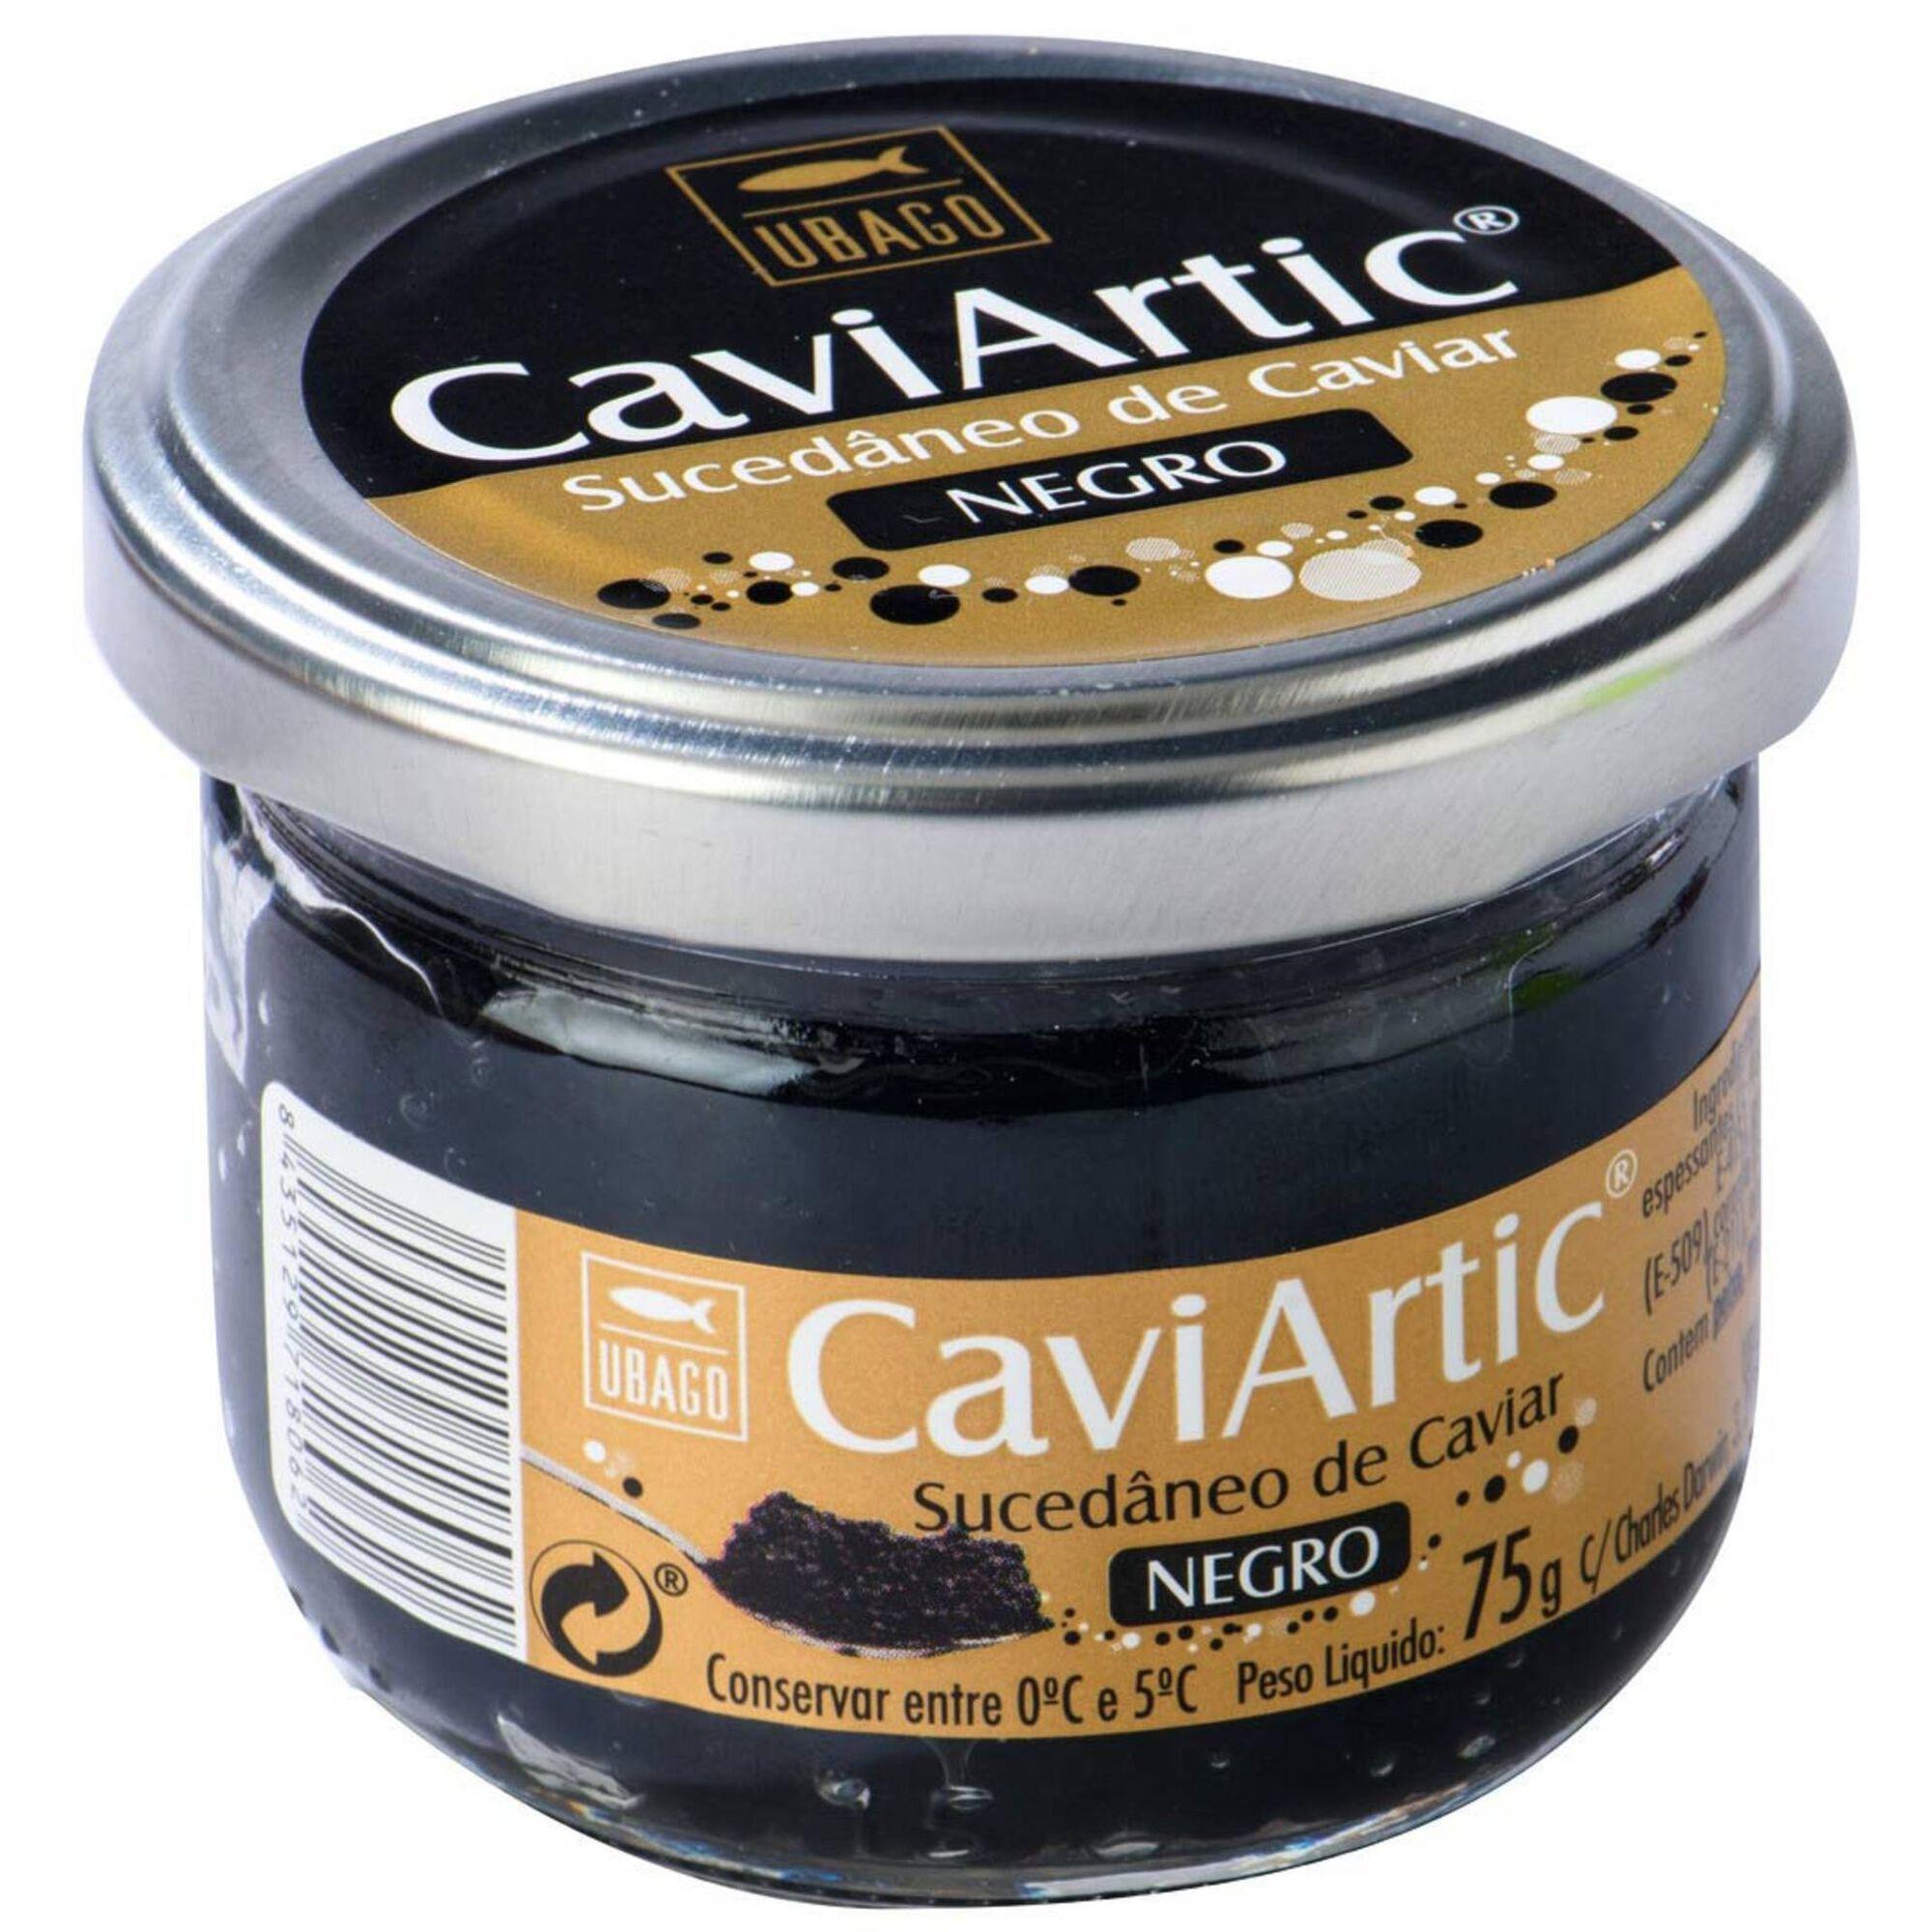 Sucedâneo Caviar Preto Caviartic